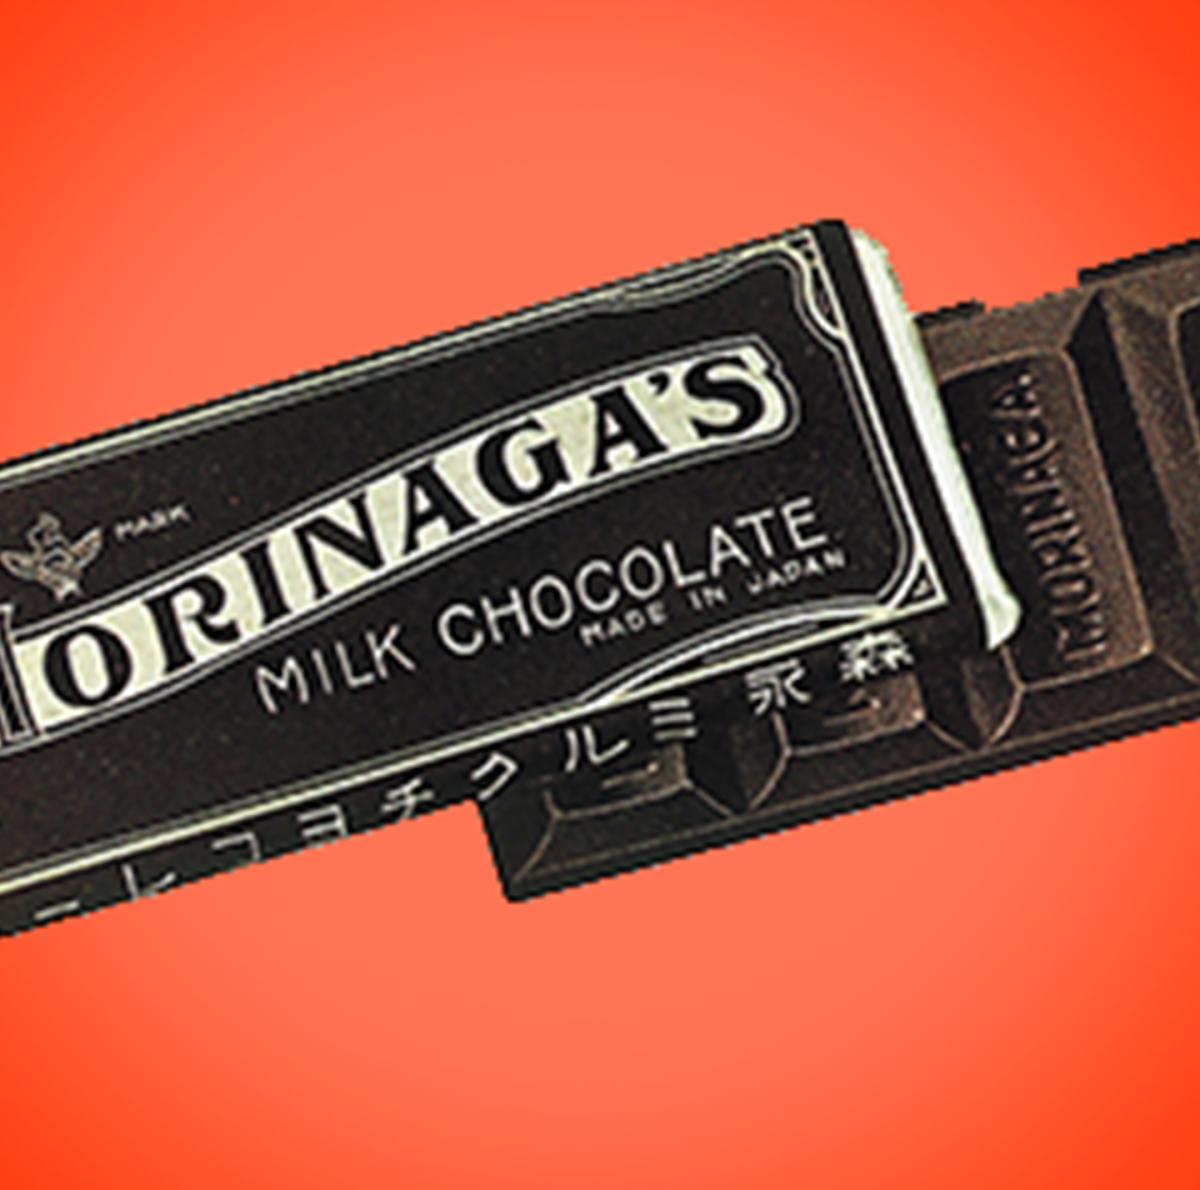 Morinaga 1918 Milk Chocolate